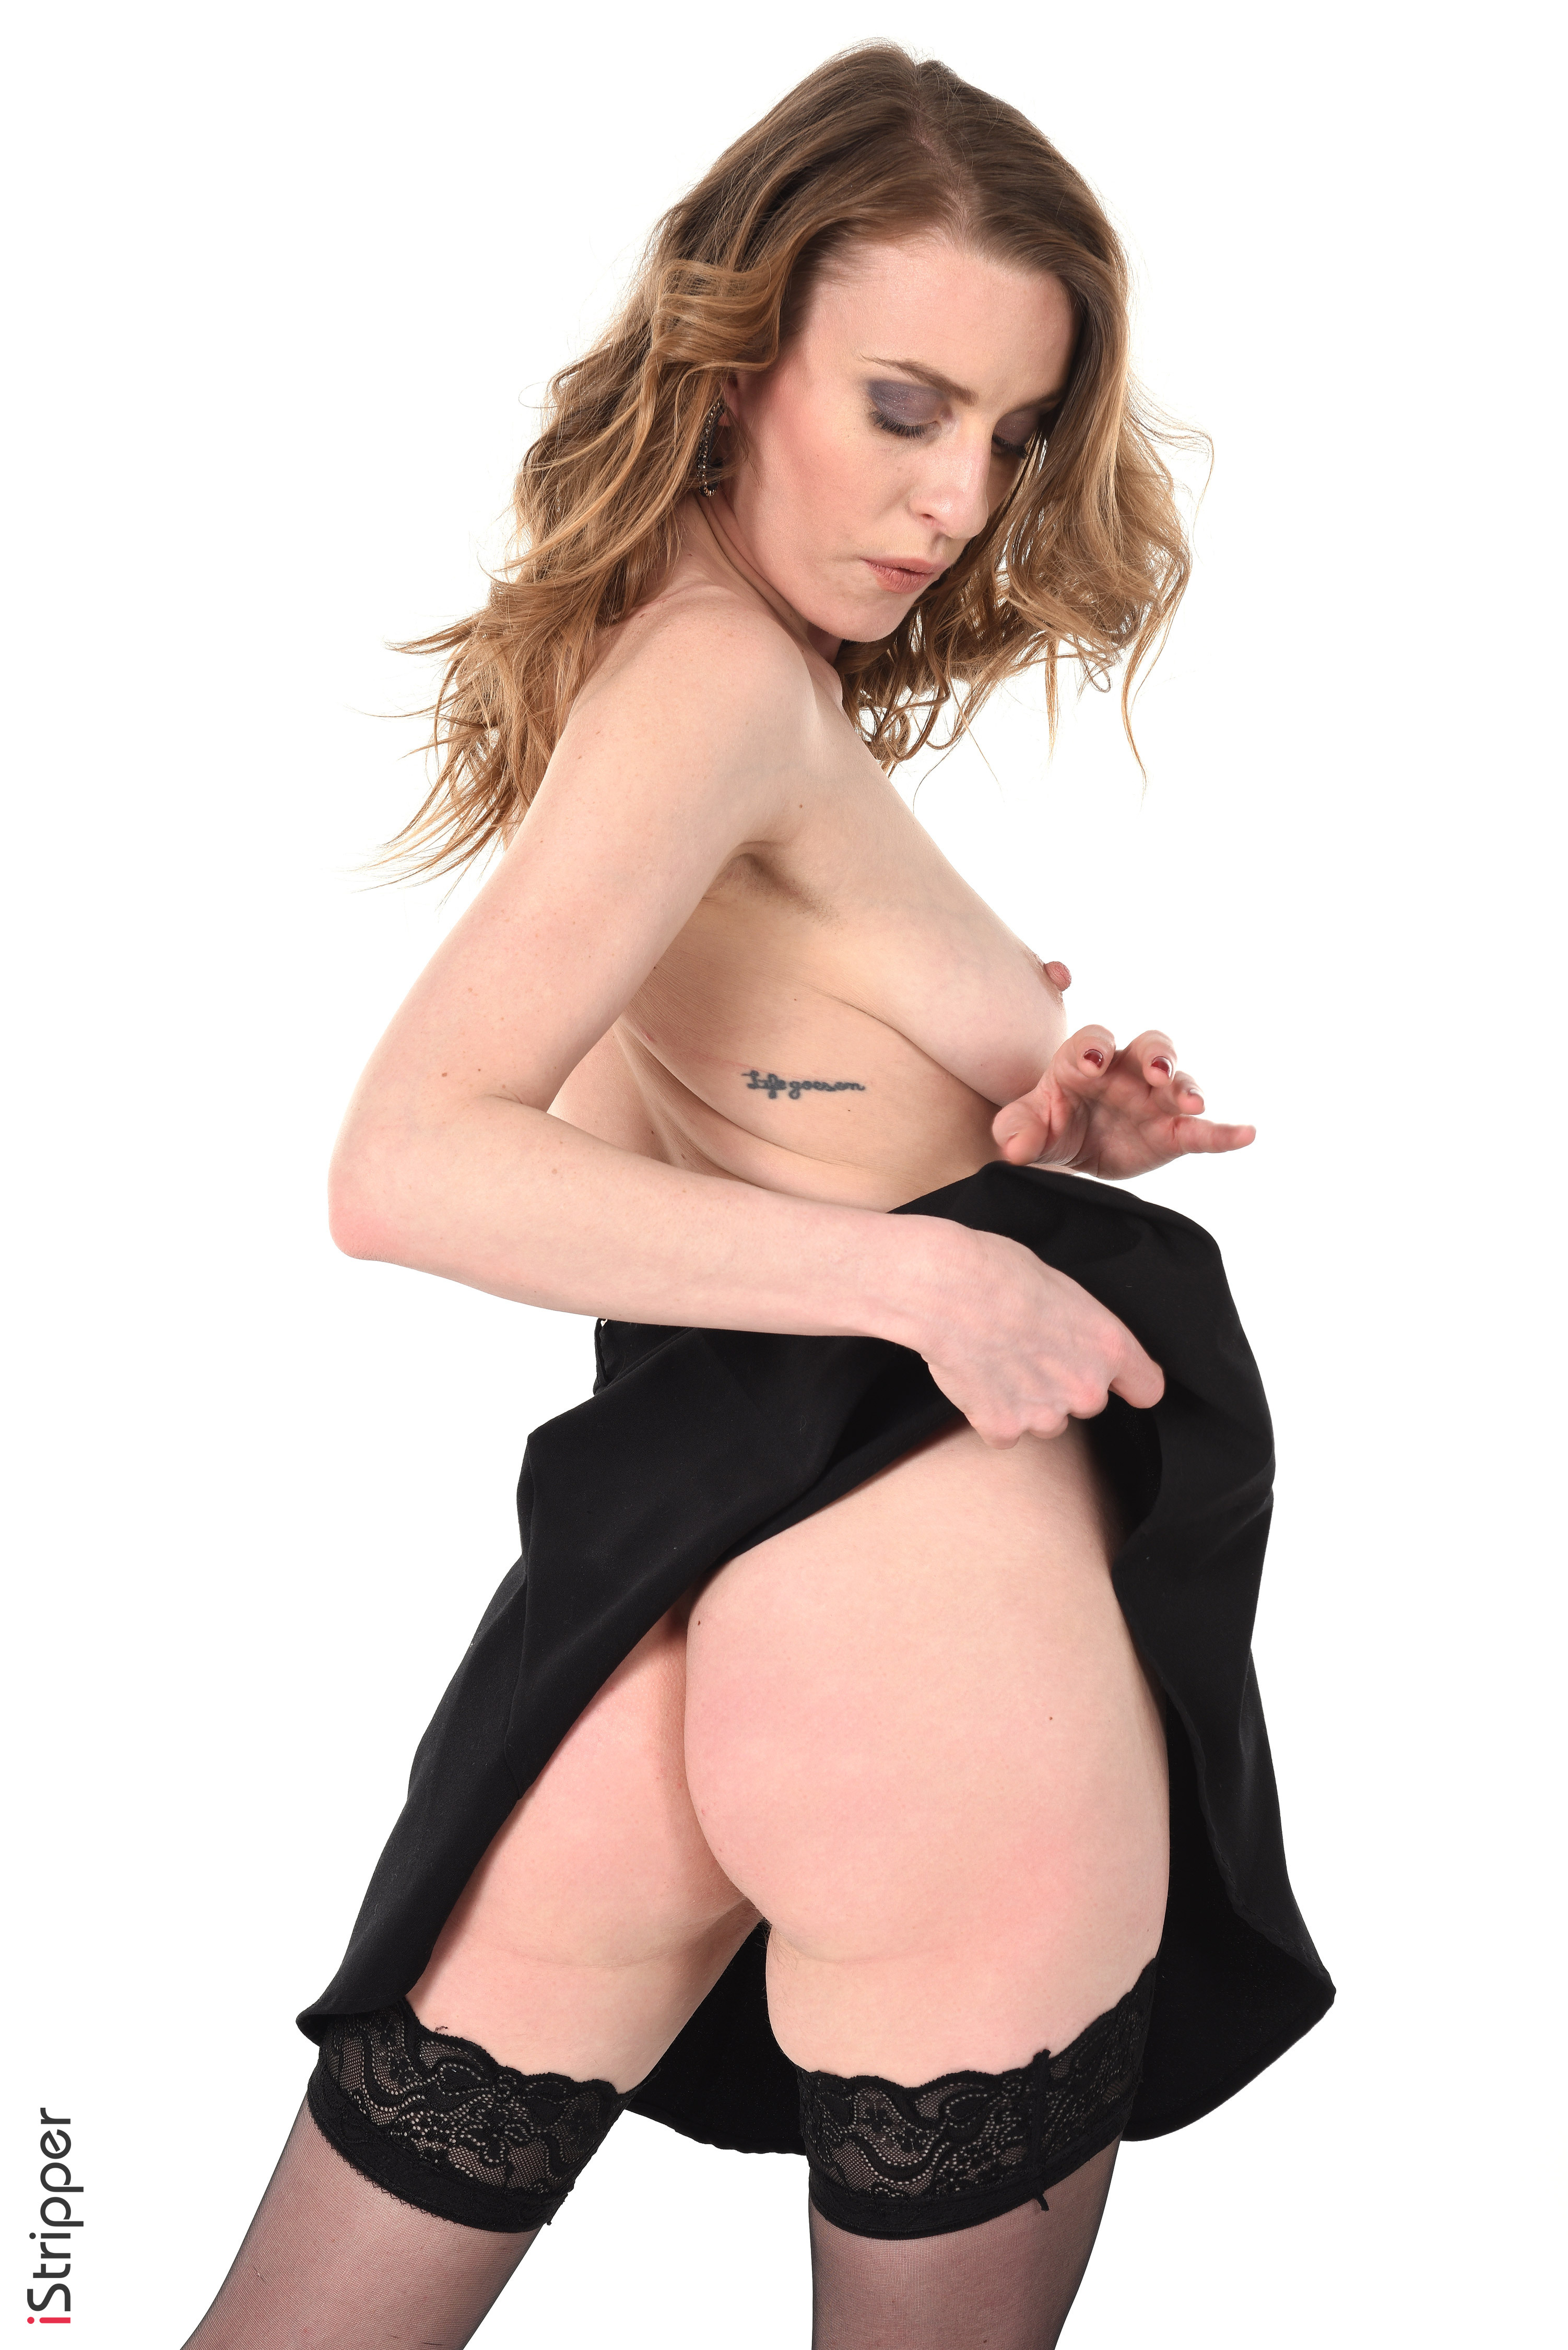 virtual female stripper free